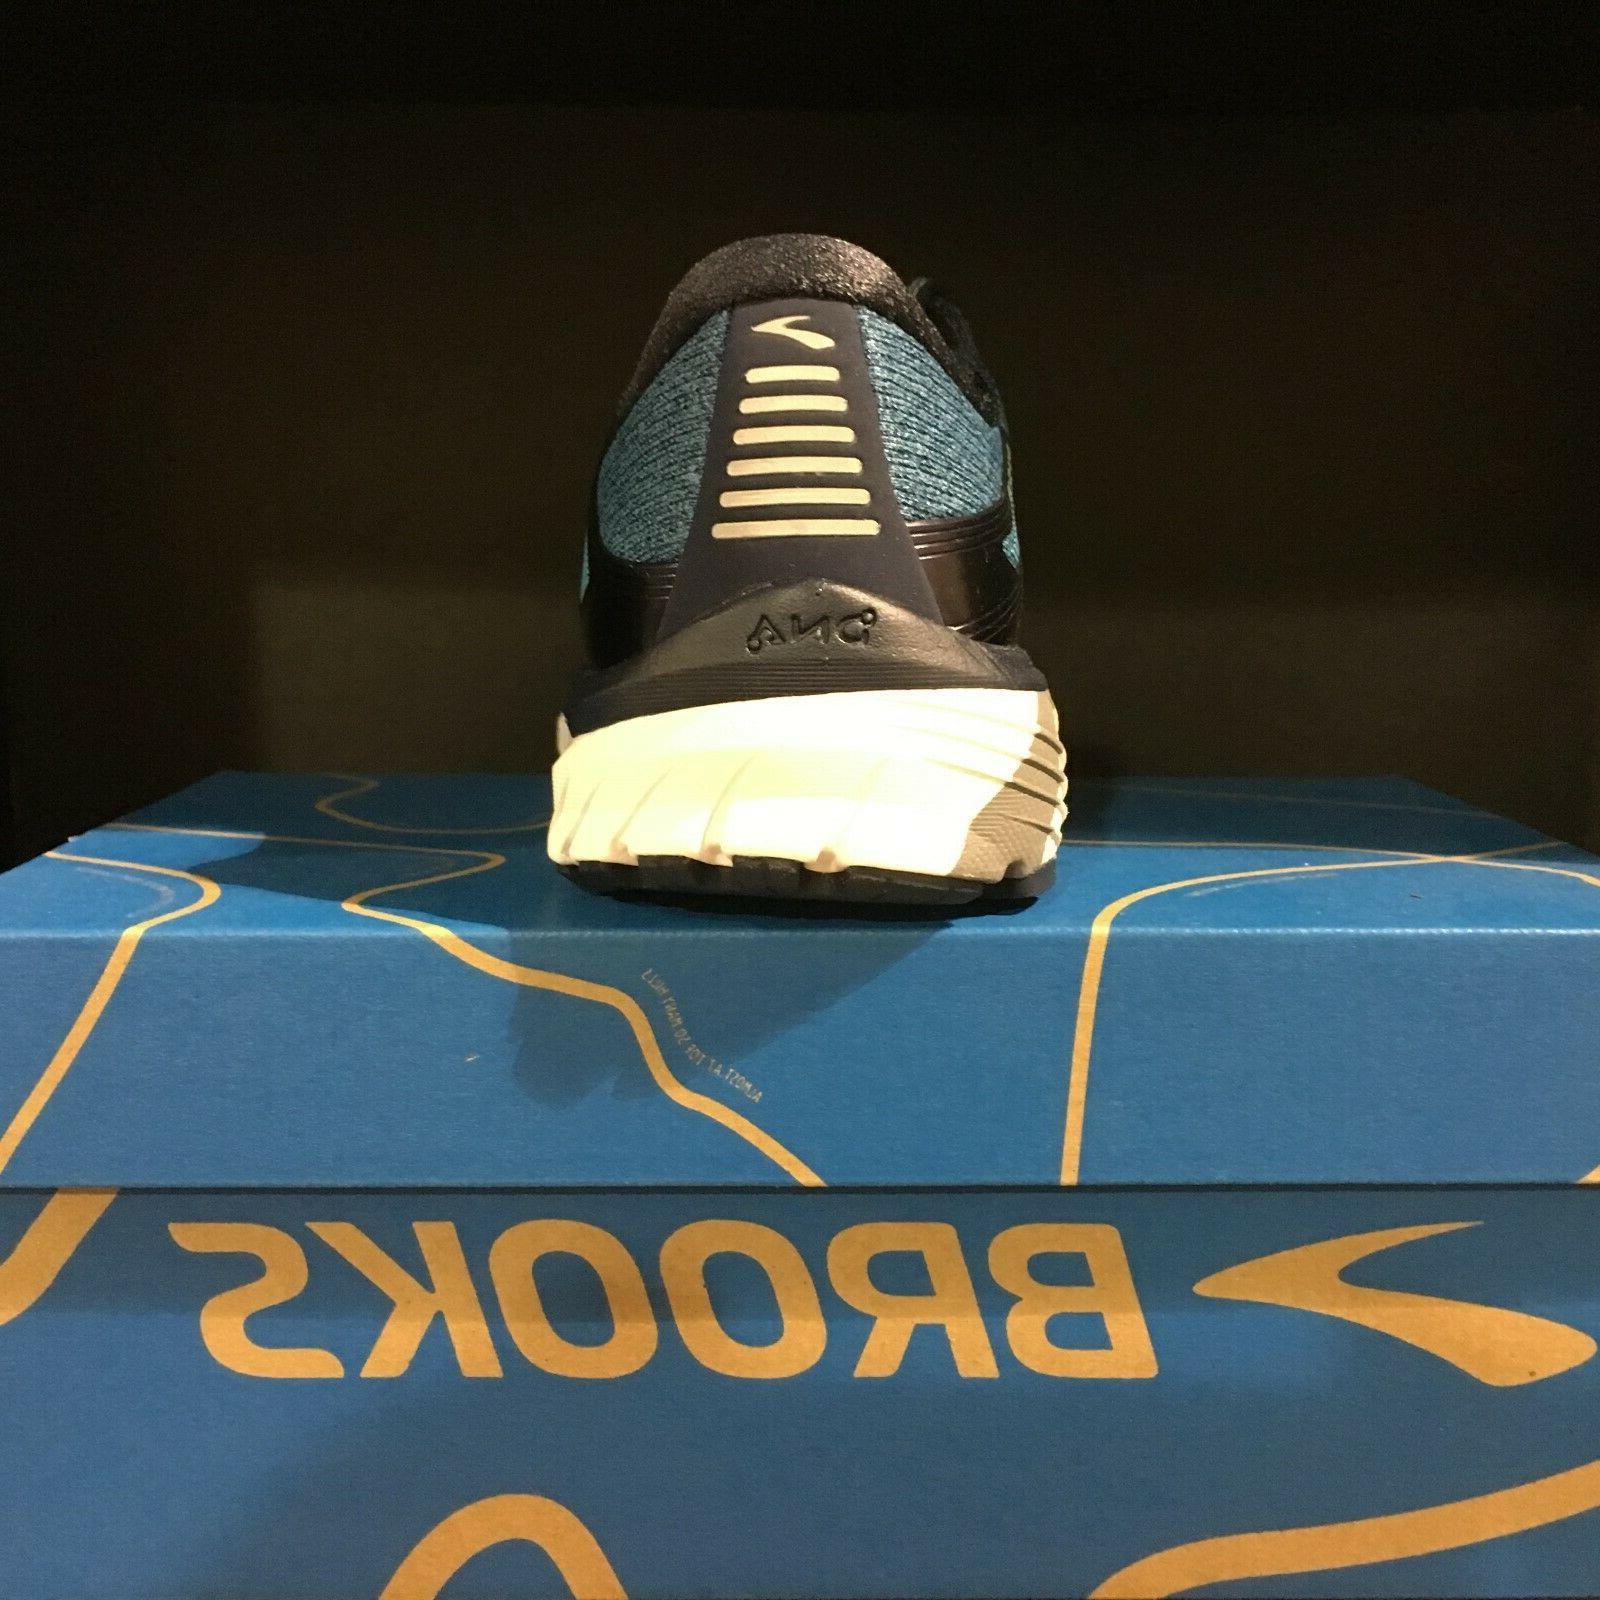 Brooks Womens 18 Shoes Teal Mint 495